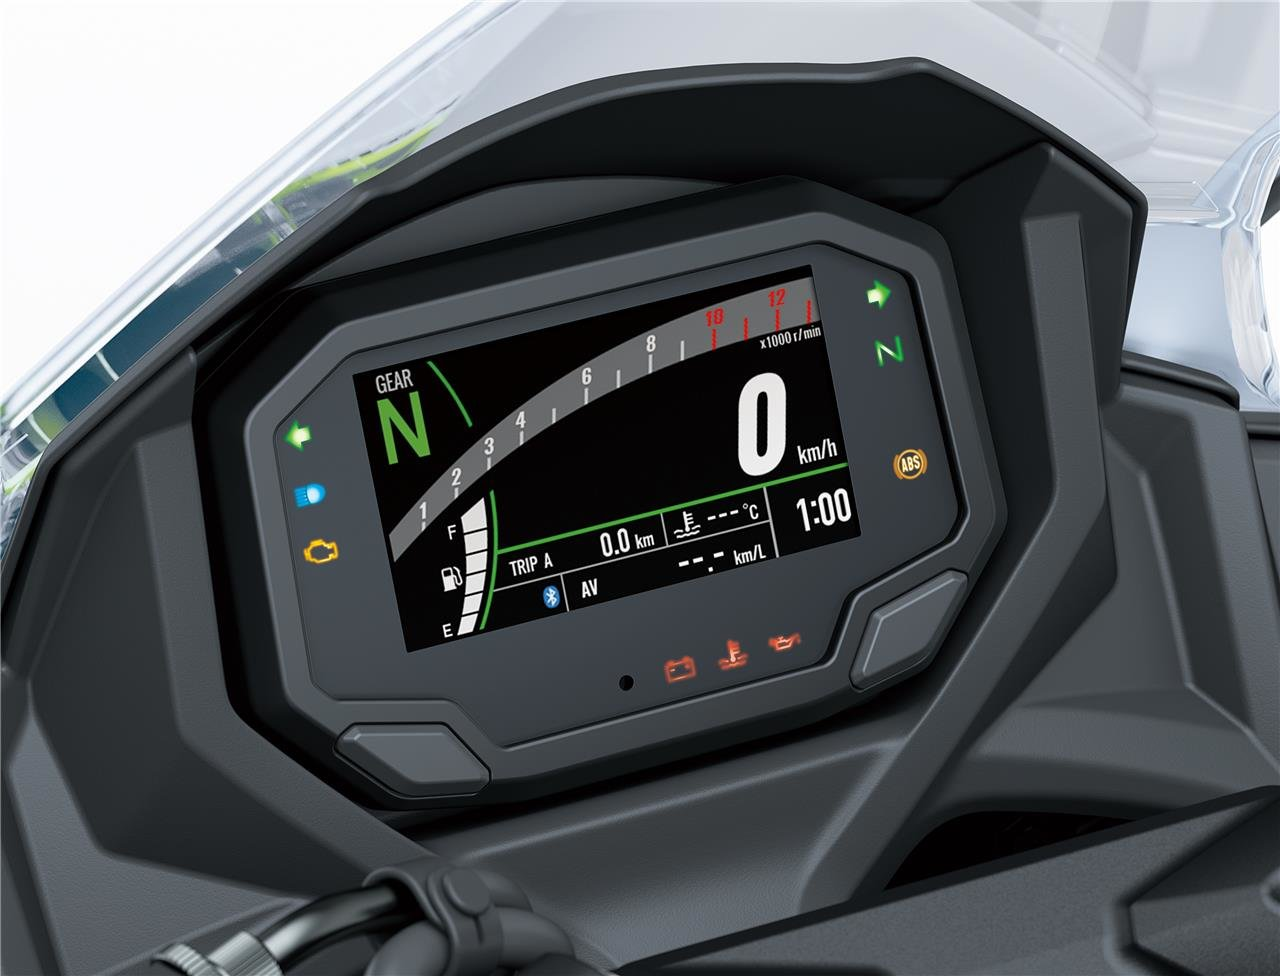 New 2020 Kawasaki Ninja 650 ABS SE *£99 Deposit 0% APR* For Sale (picture 5 of 6)